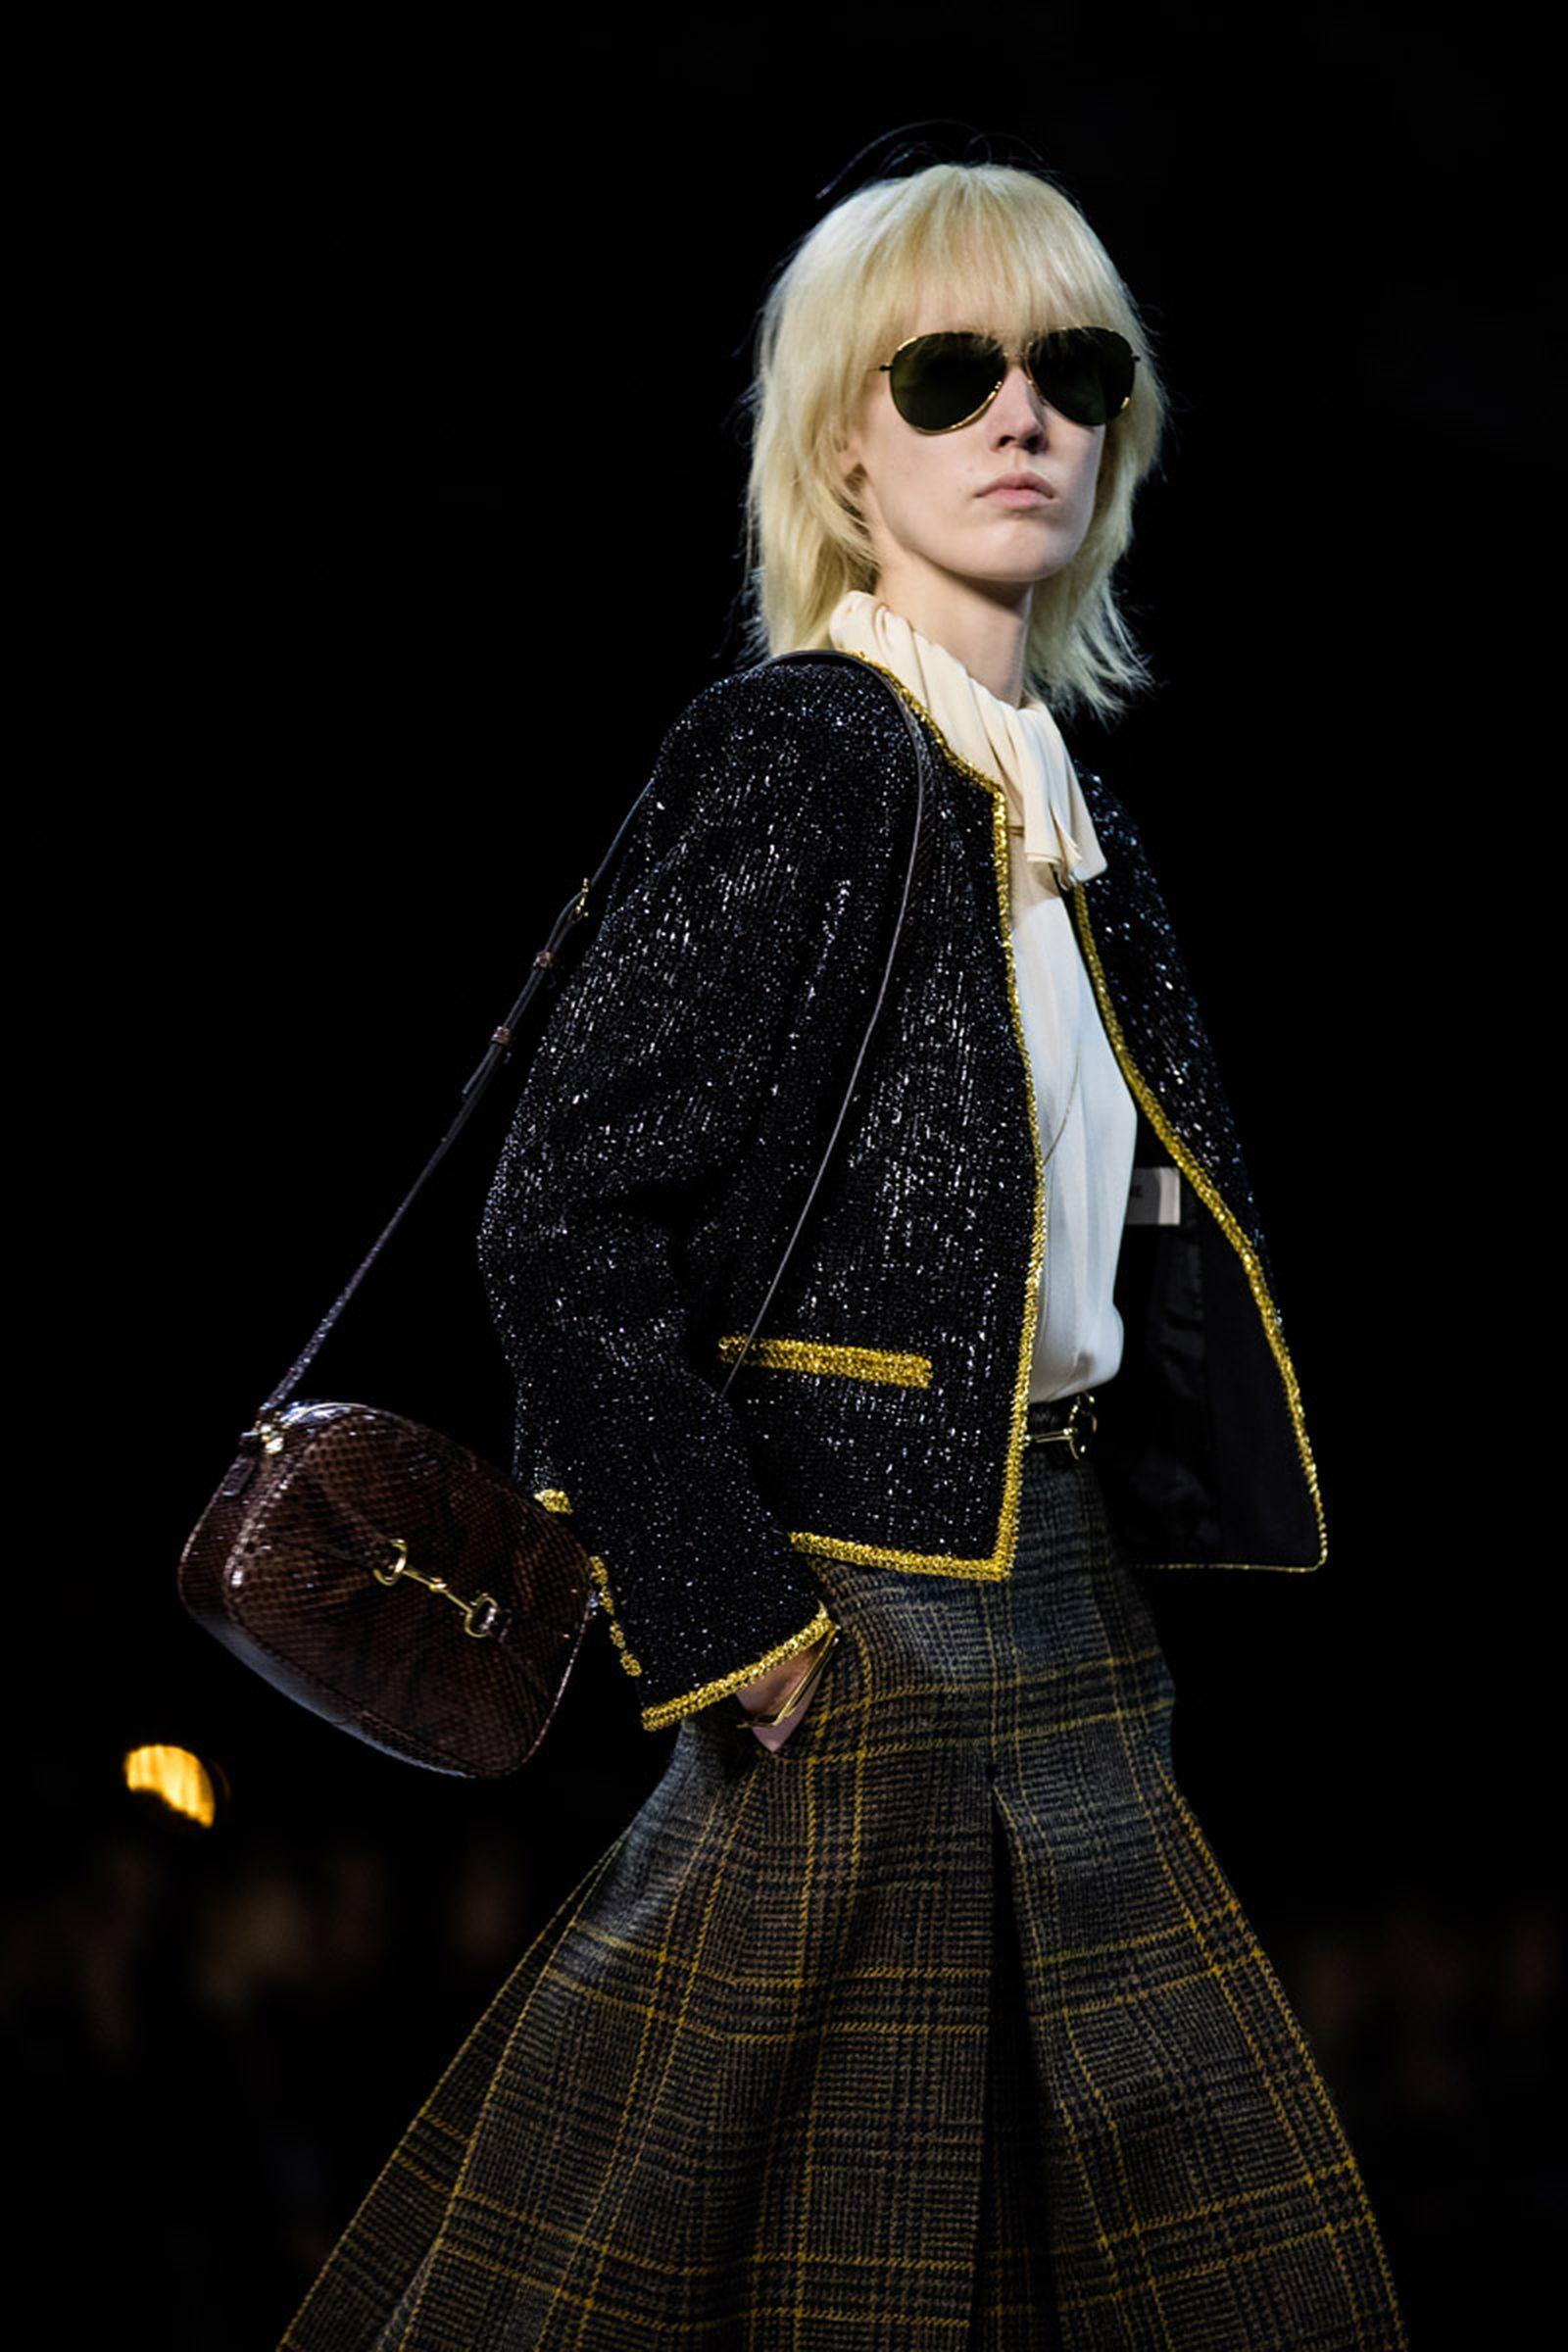 3celine fw19 womens paris fashion week